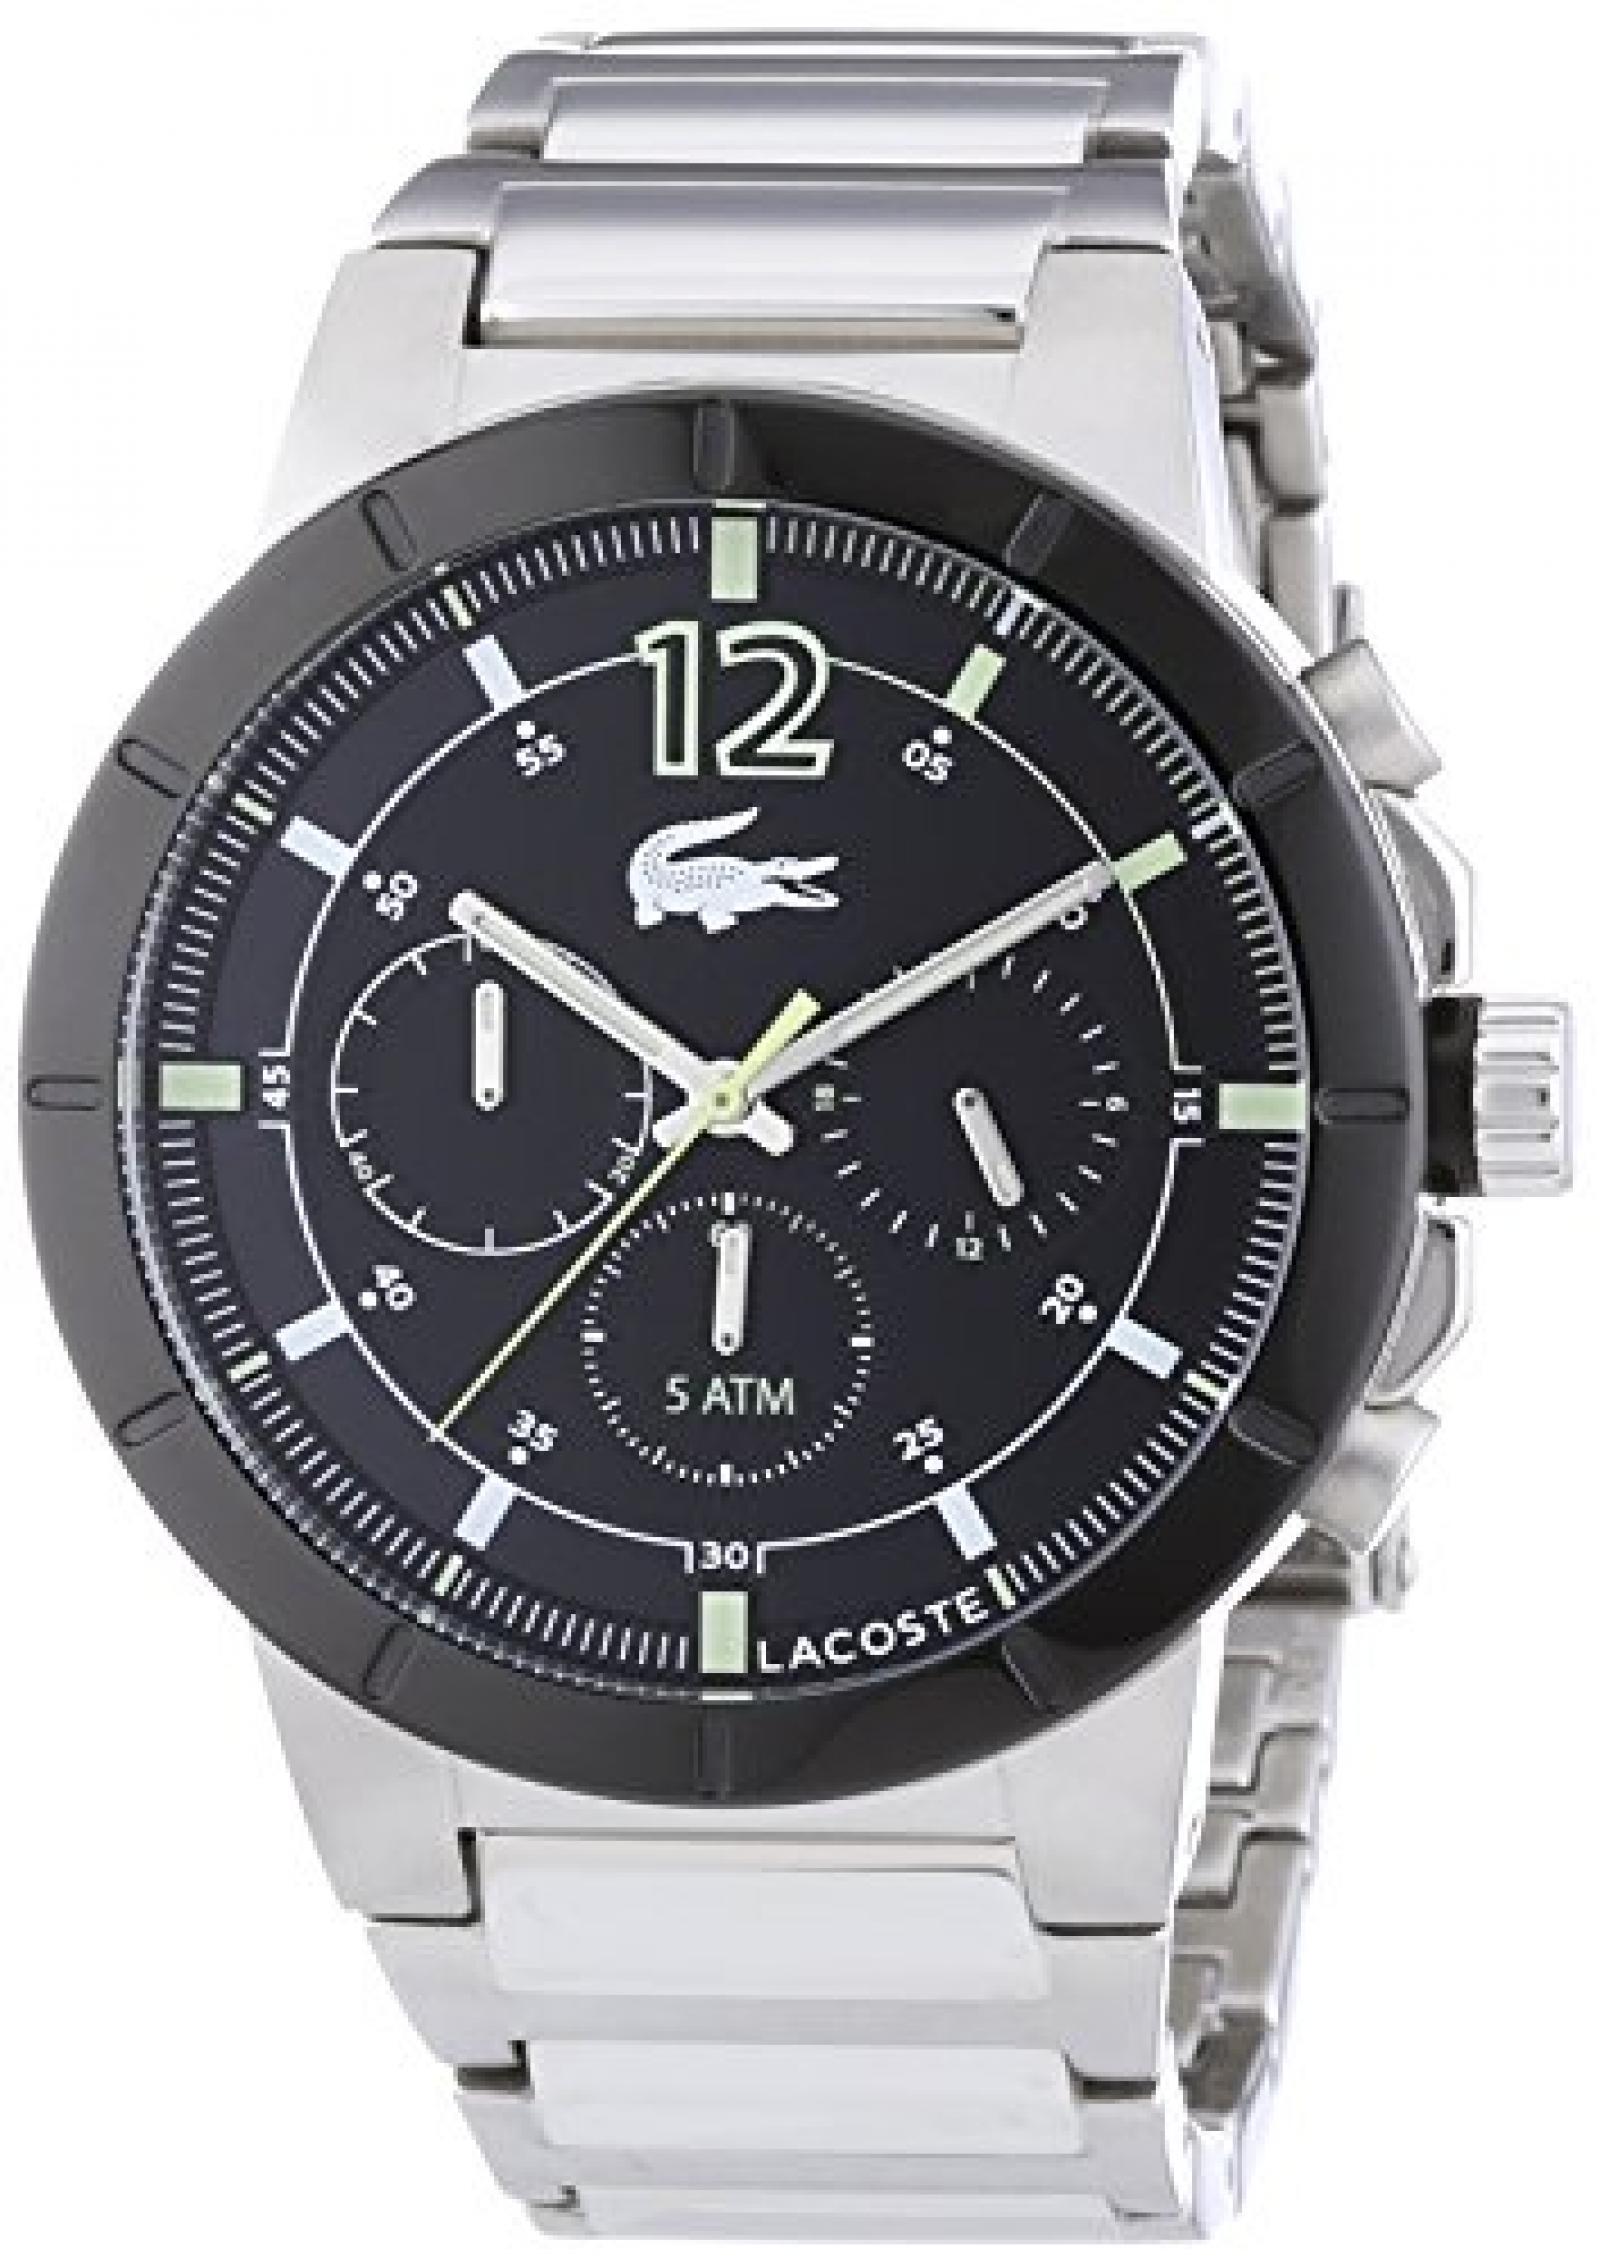 Lacoste Herren-Armbanduhr XL DARWIN Analog Quarz Edelstahl 2010744